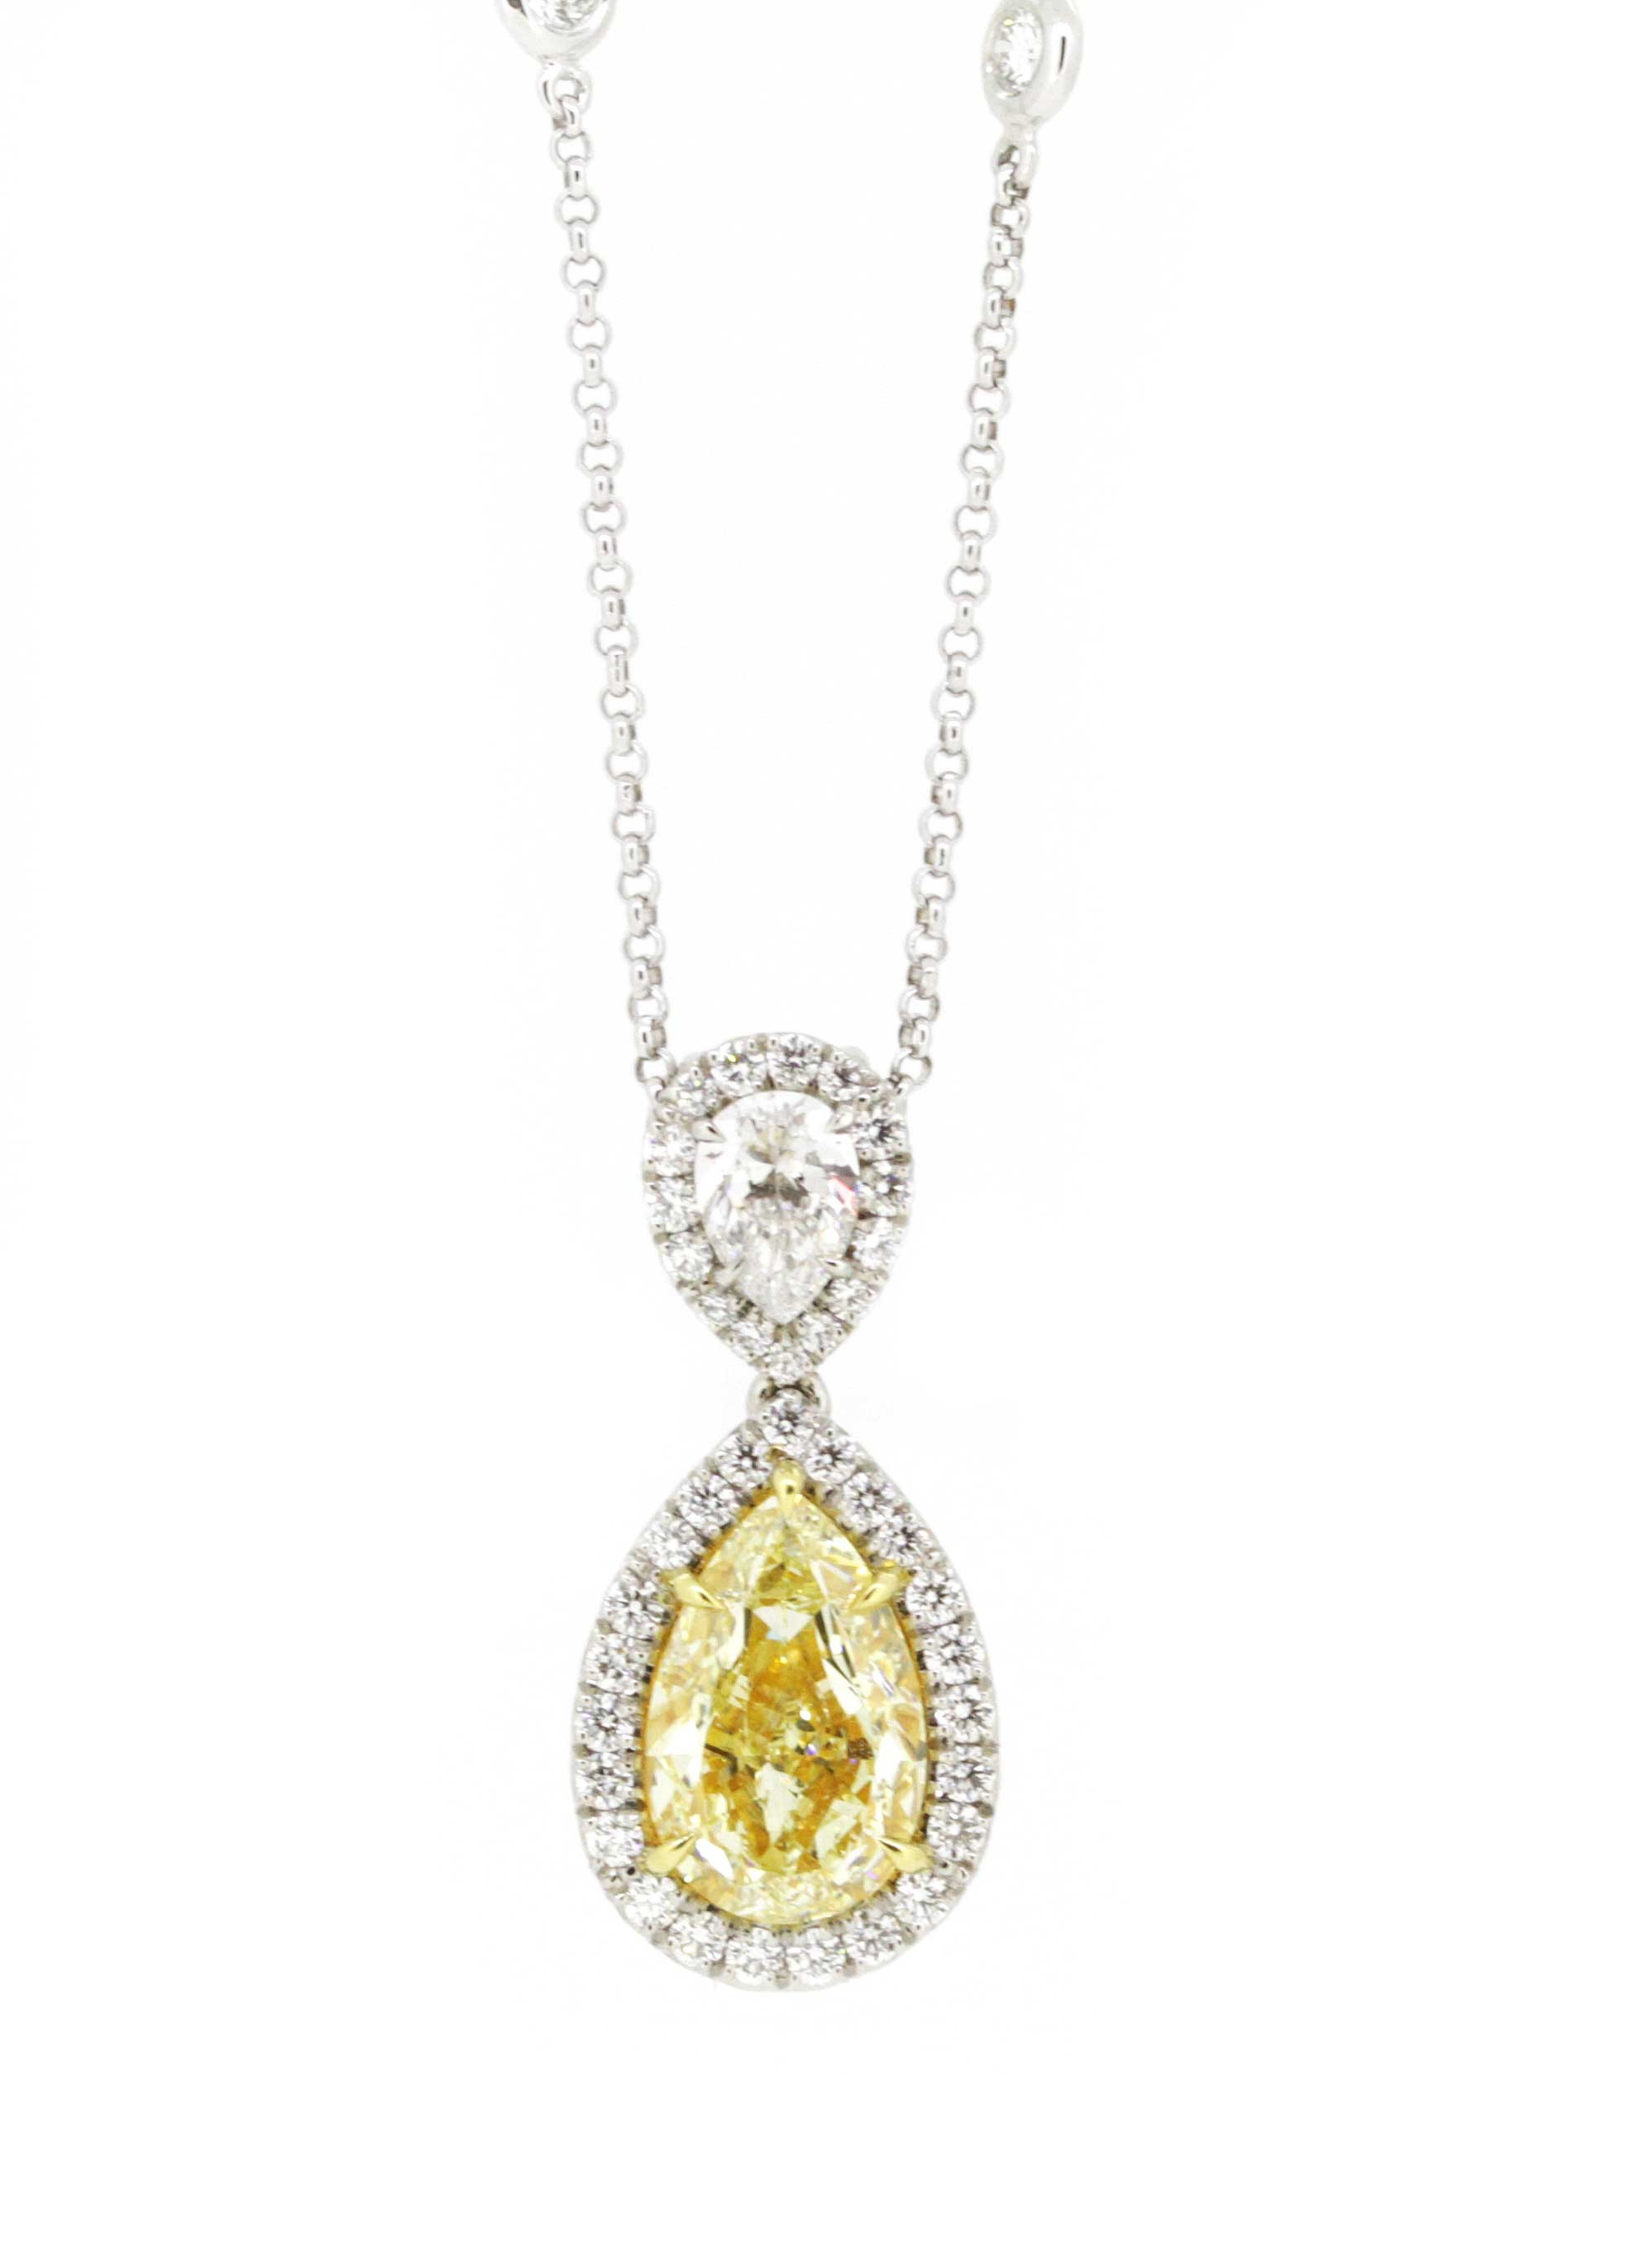 Yellow diamond and white diamond double pear shape pendant